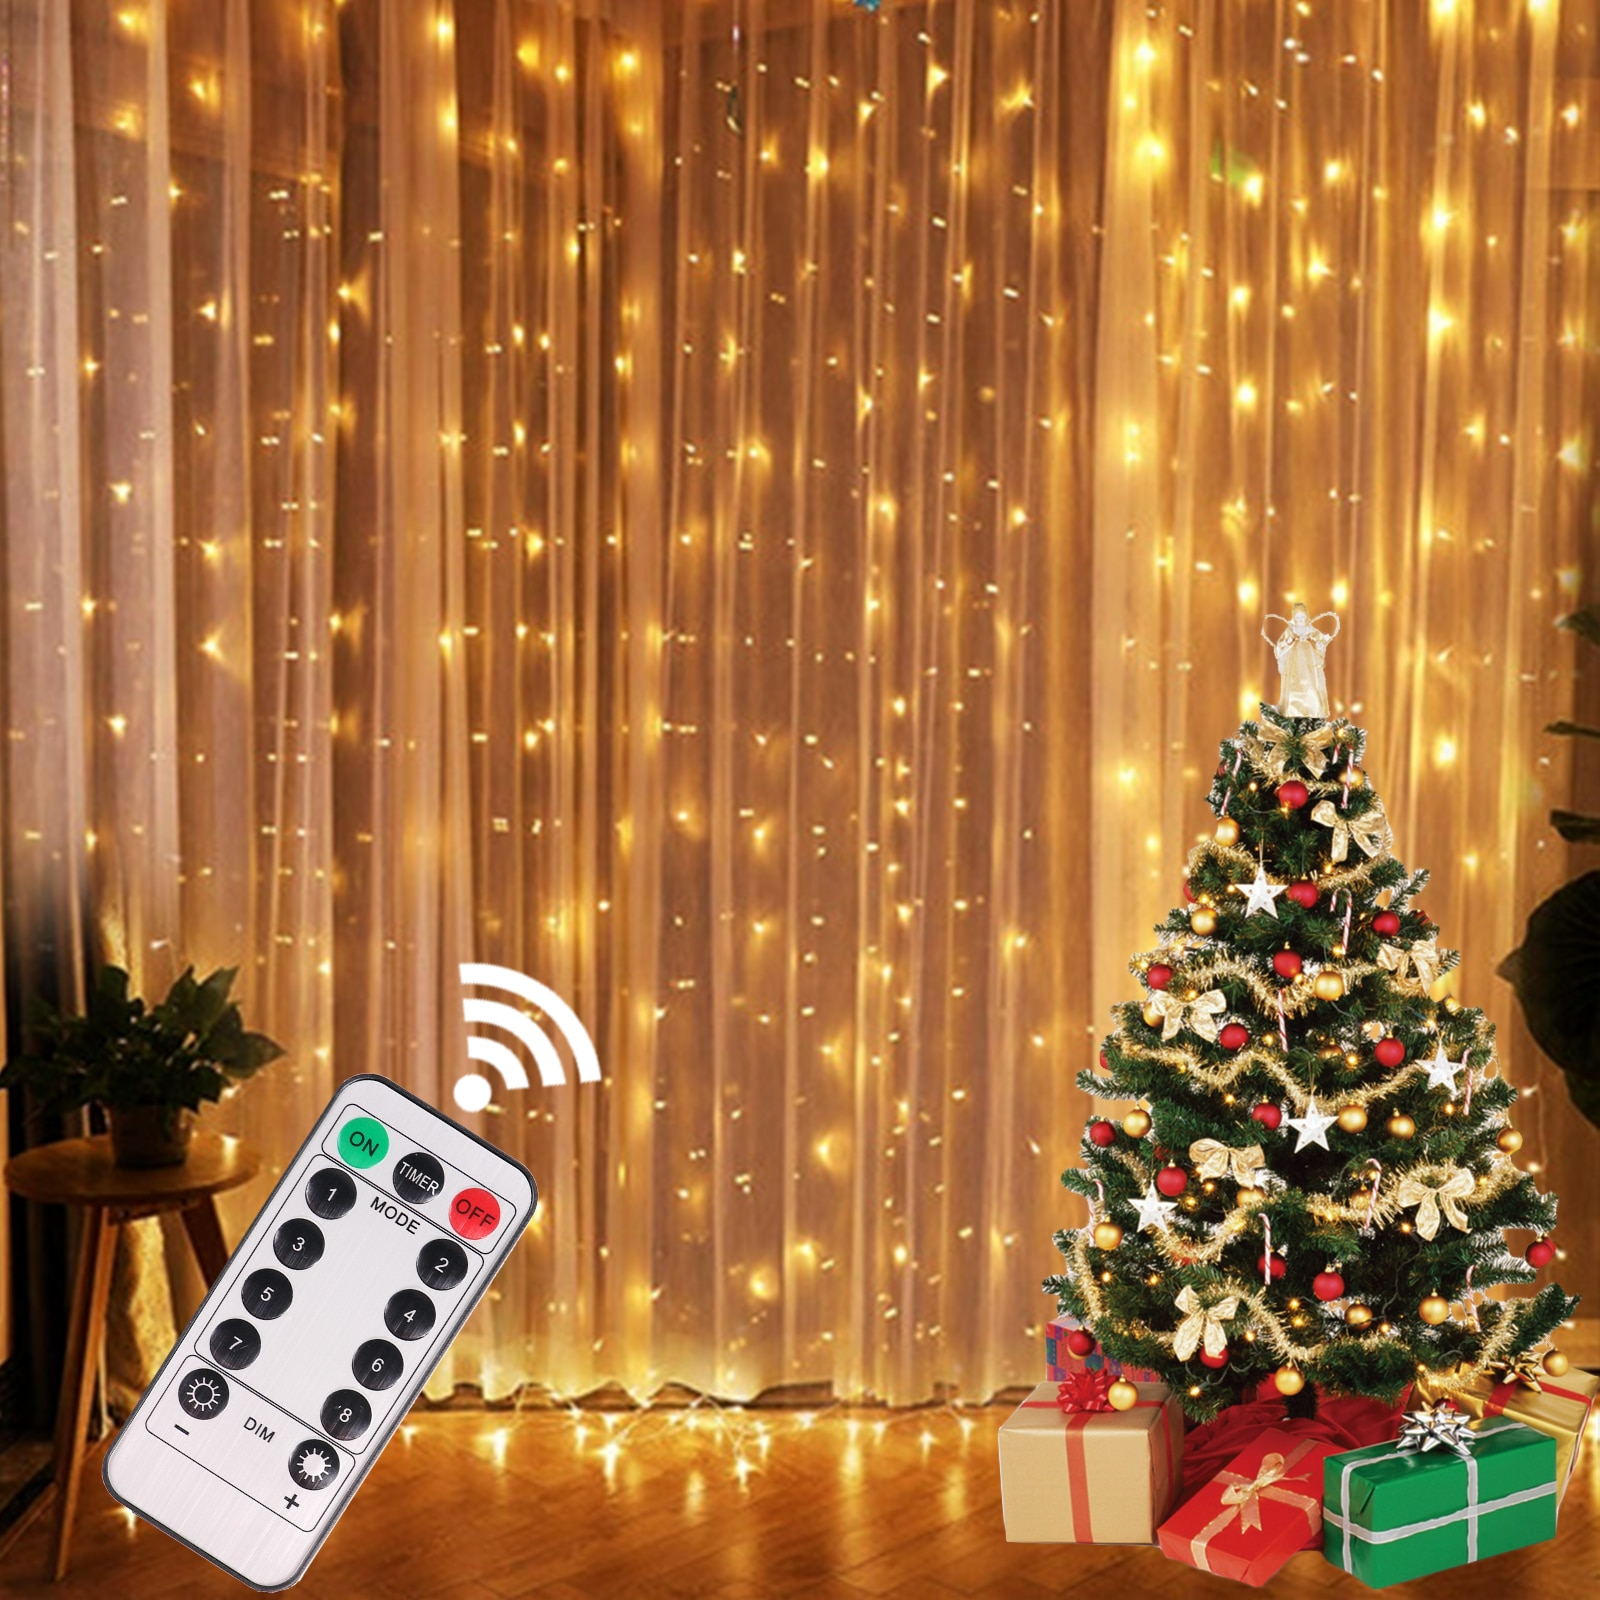 USB Festoon String Light Fairy Garland Curtain Light Christmas Light Christmas Decor For Home Holiday Decorative New Year Lamp